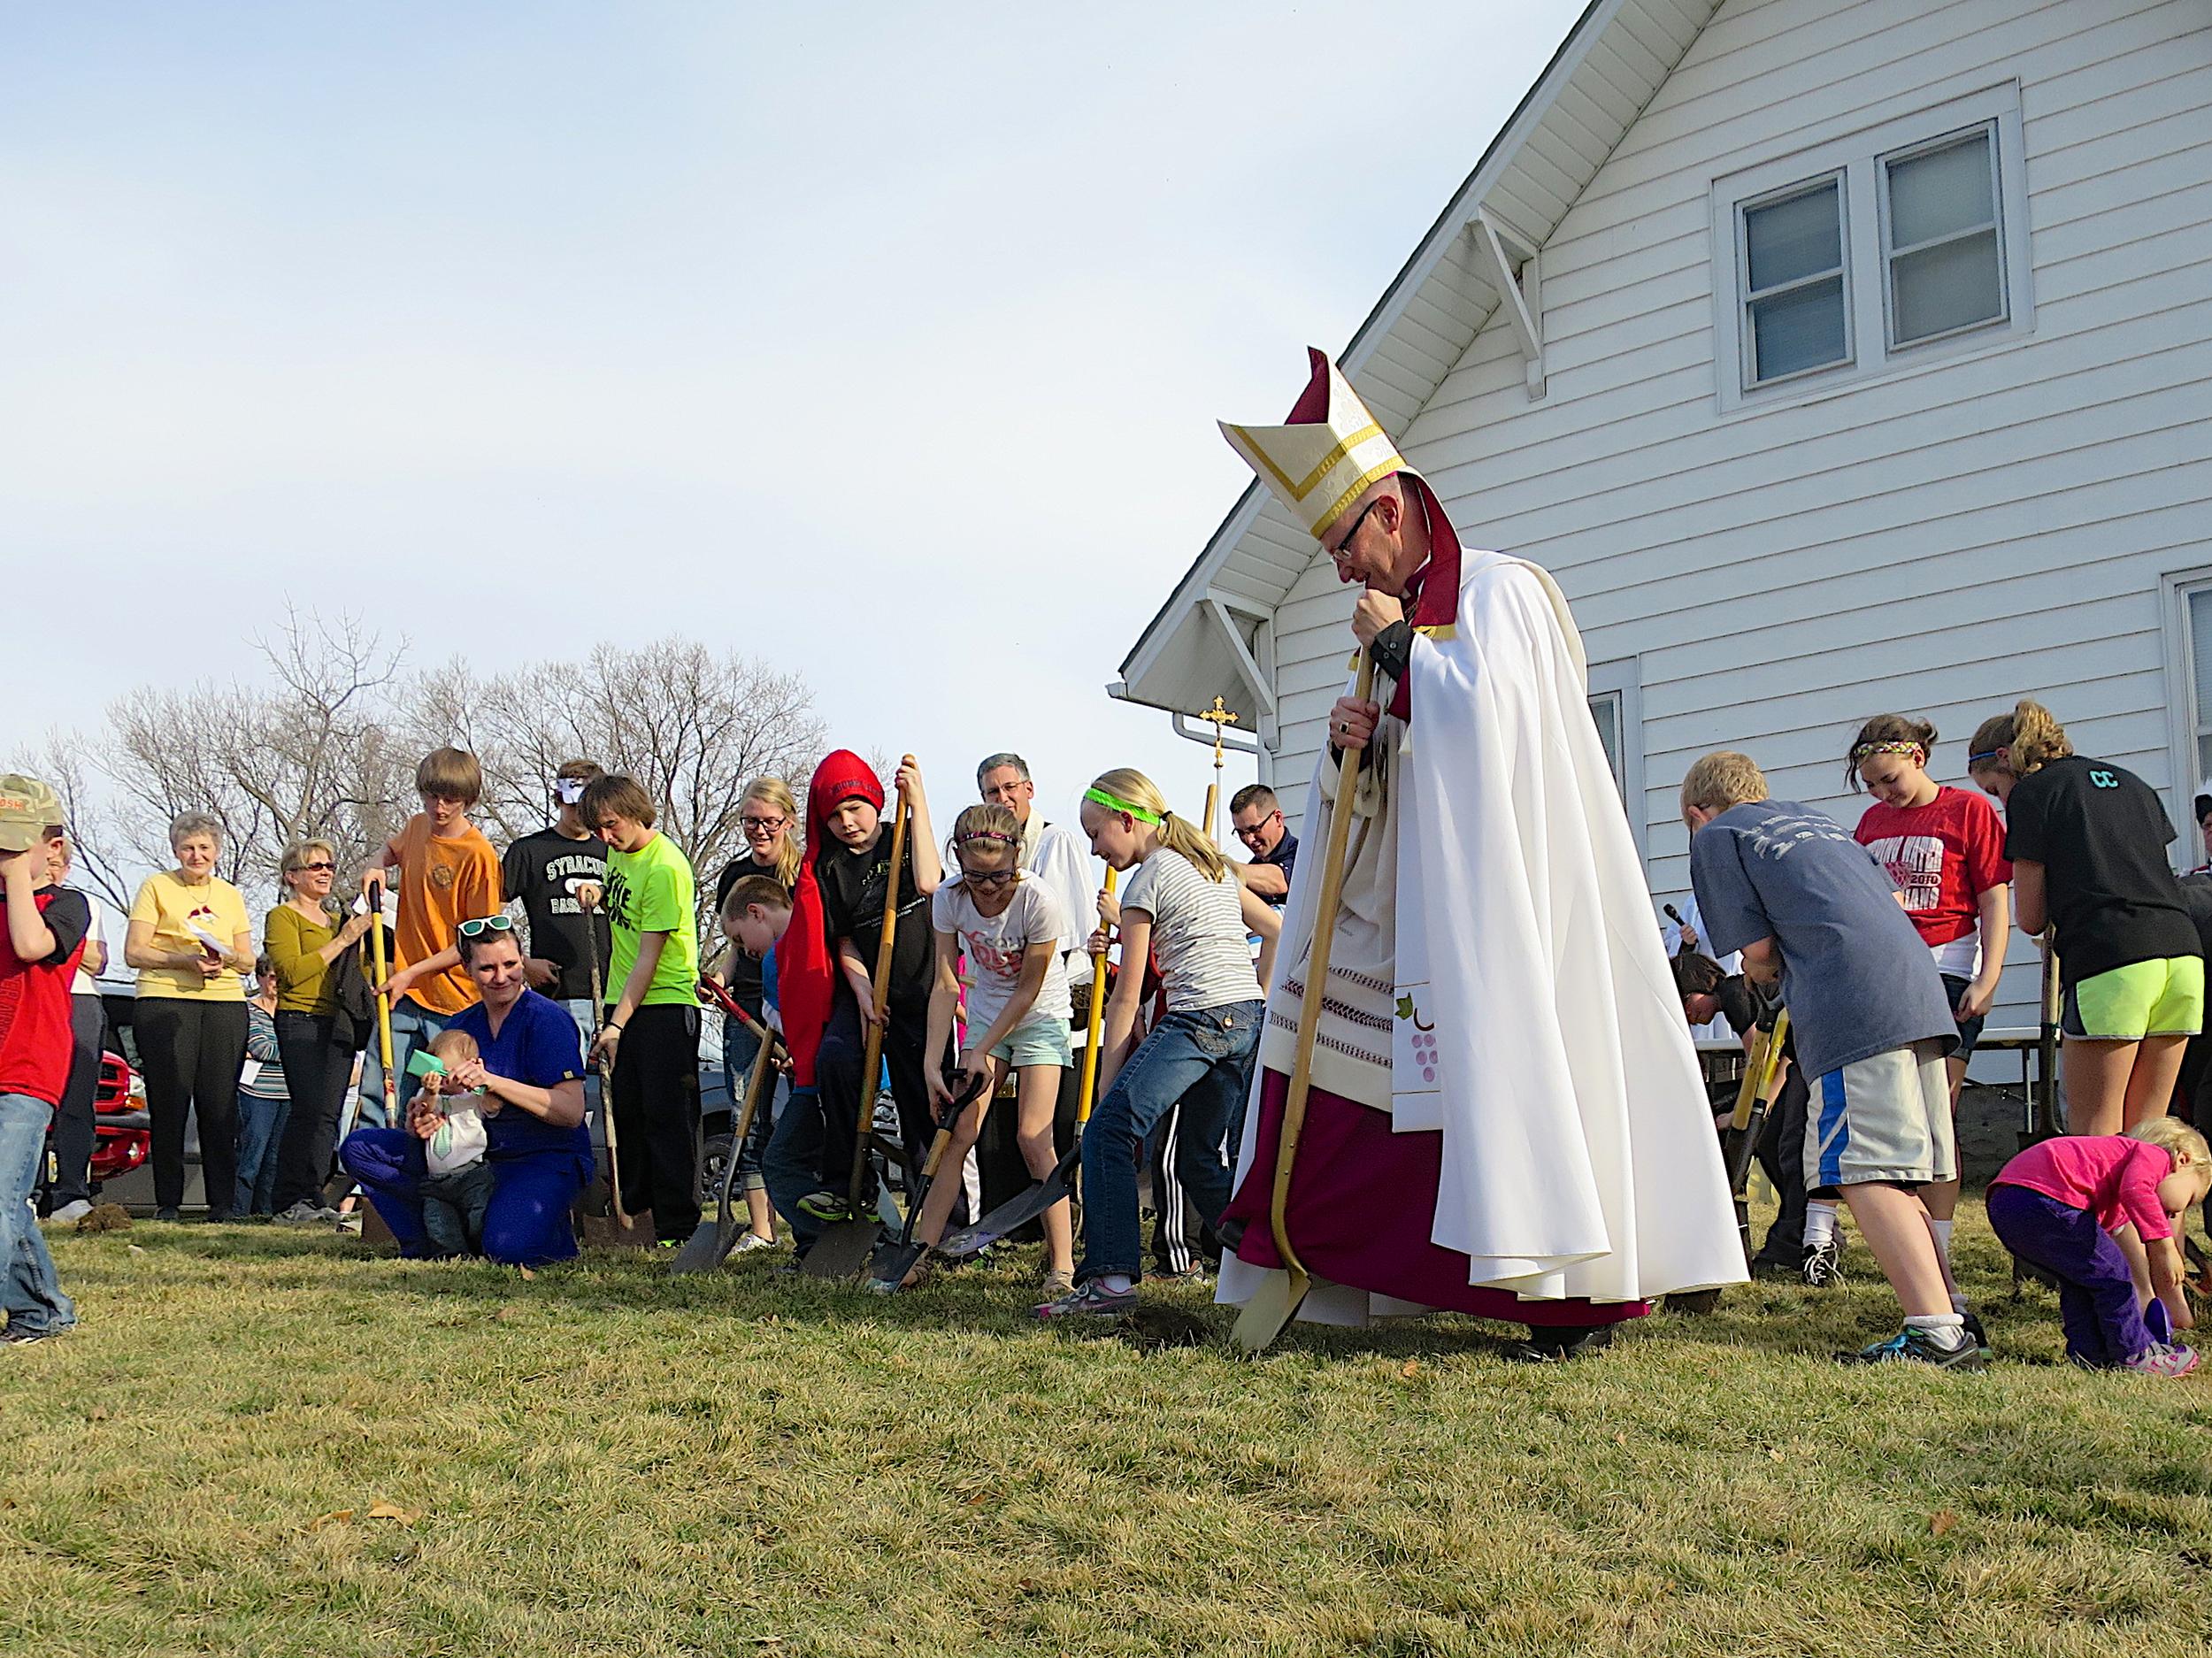 2014-04-09 Groundbreaking with Bishop Conley